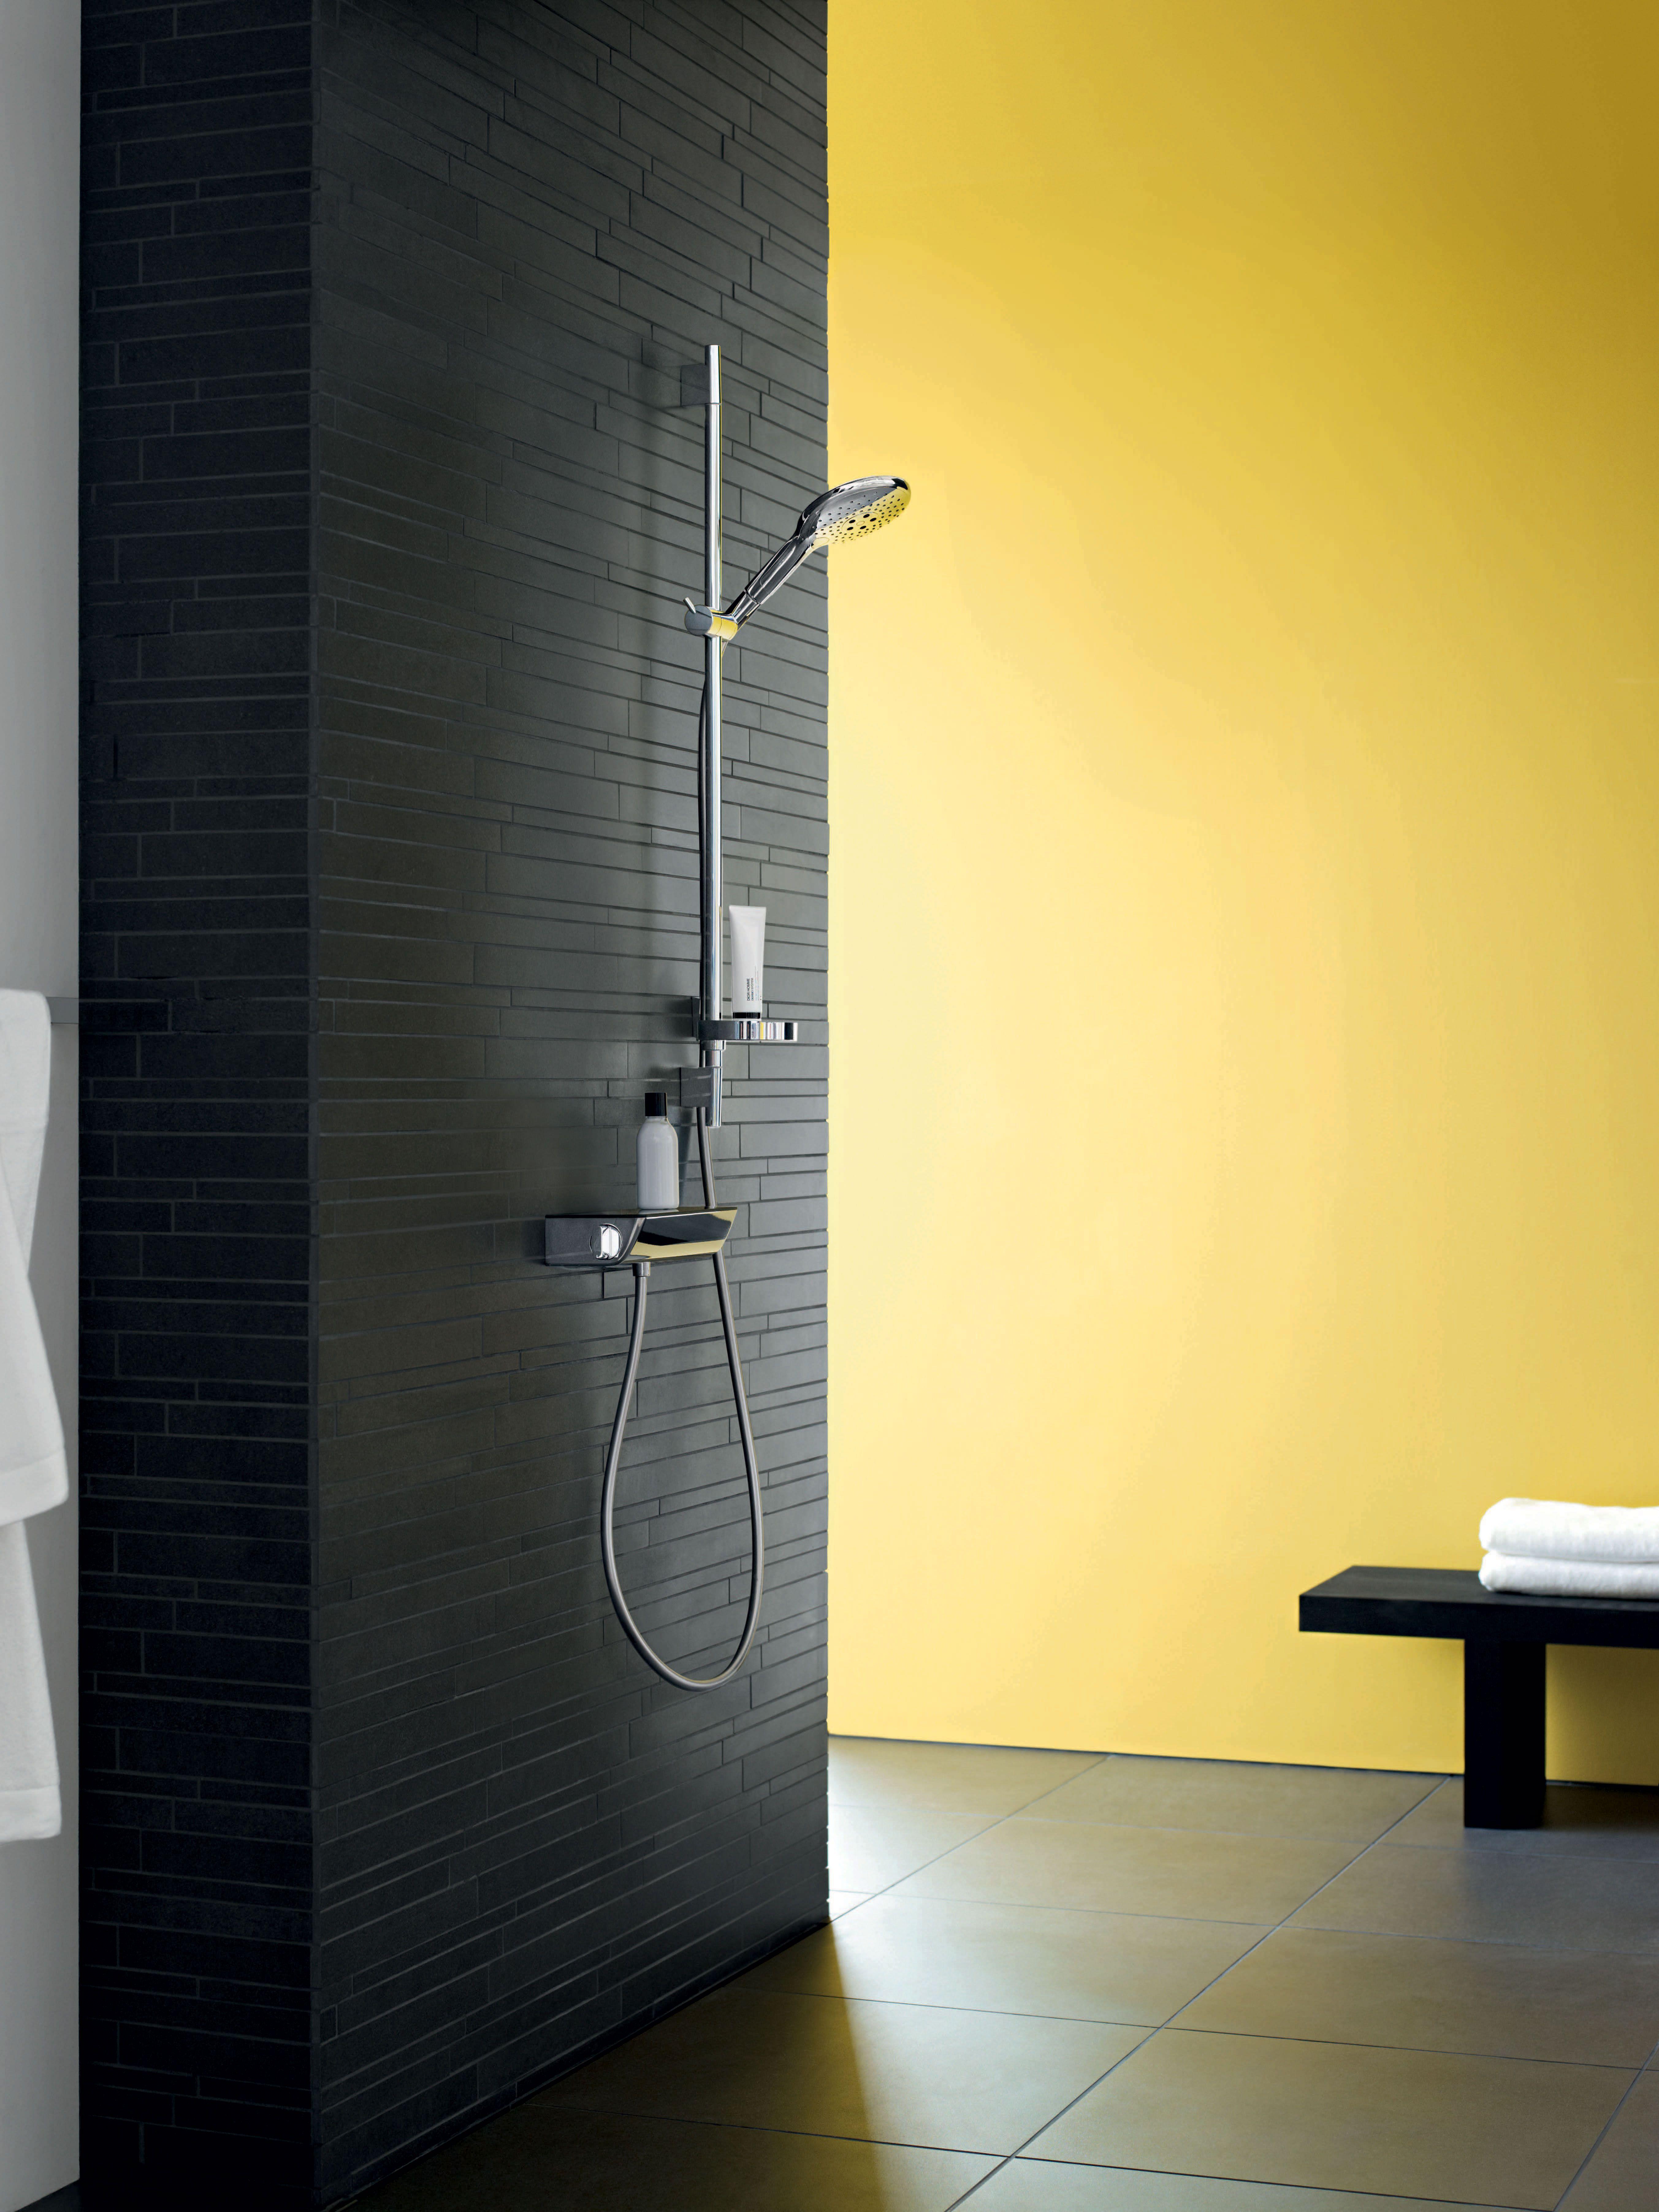 Hansgrohe Raindance Select Ecostat Exposed Thermostat With Raindance Select Handshower Modern Bathroom Shower Design Hansgrohe Raindance